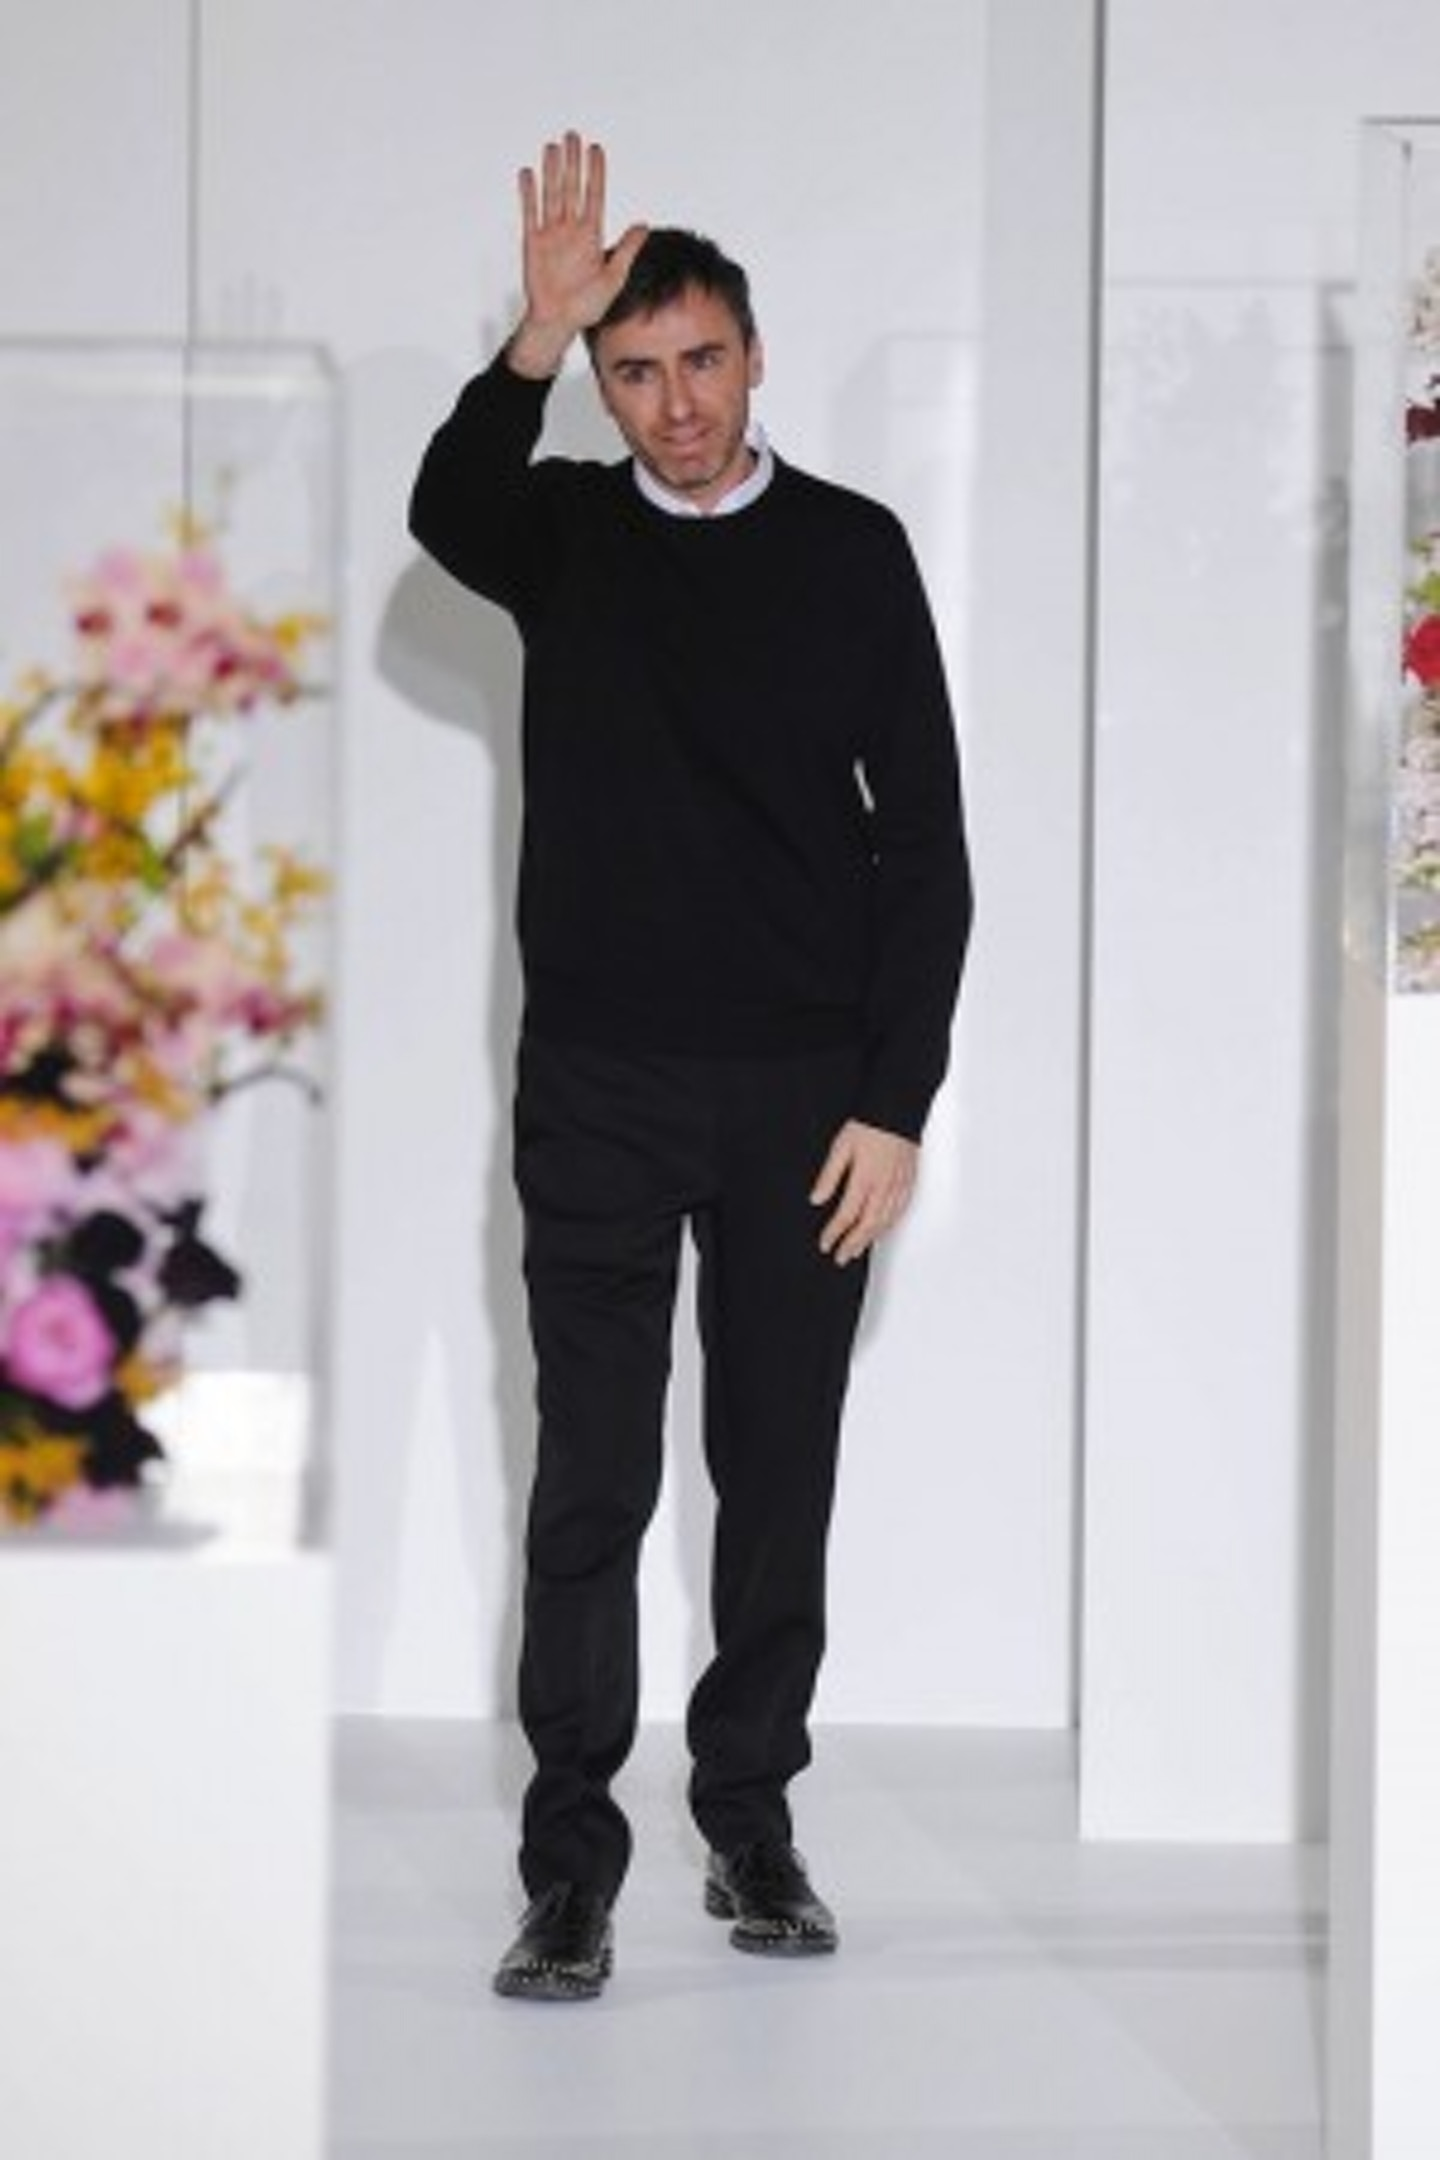 Raf Simons Named Creative Director of Dior